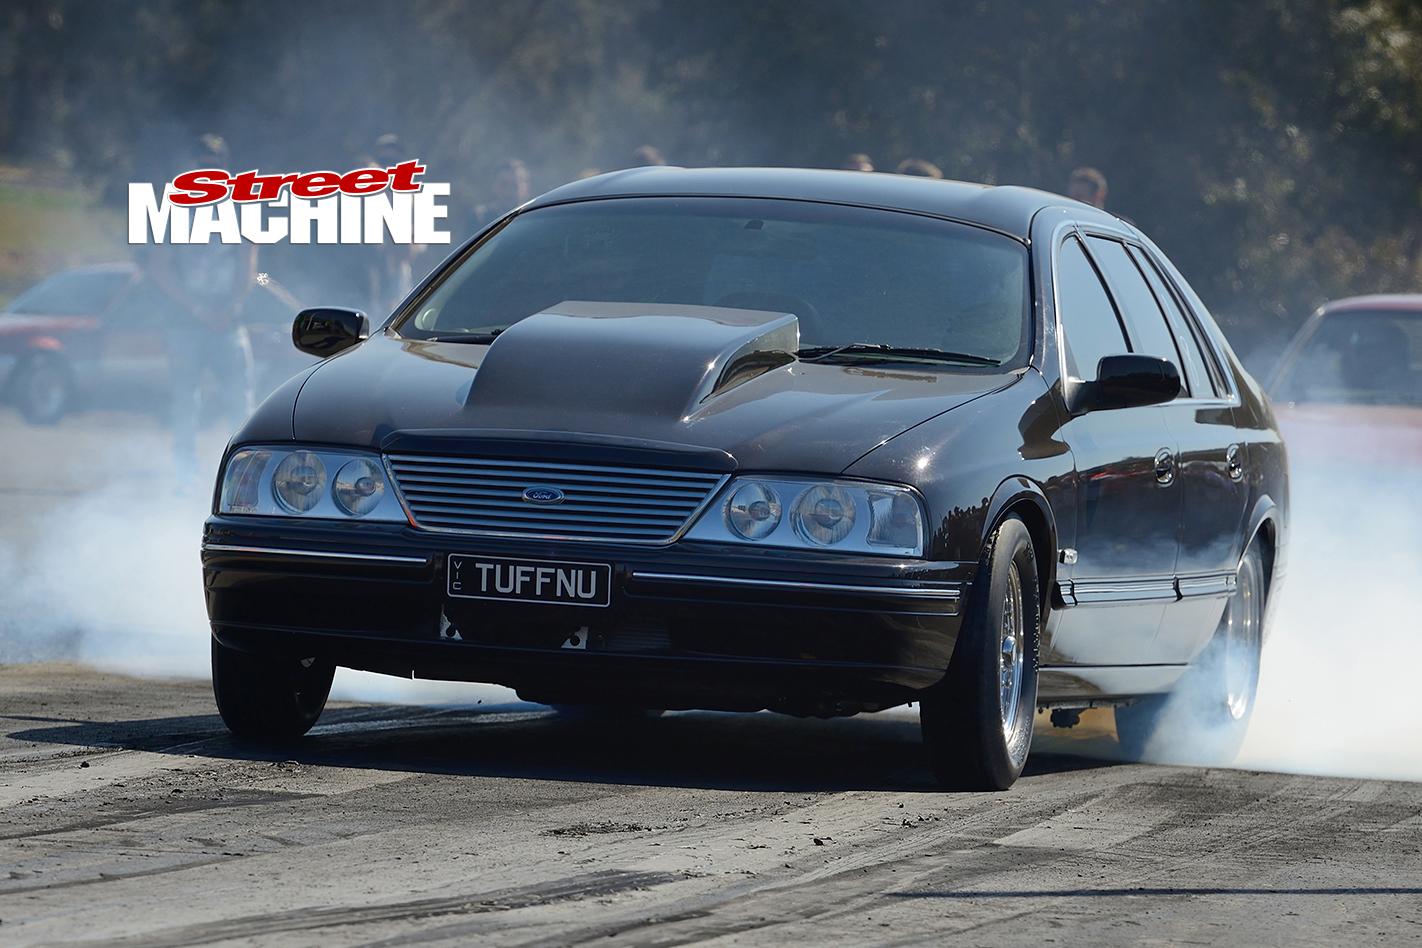 Ford -Fairlane -TUFFNU-drag